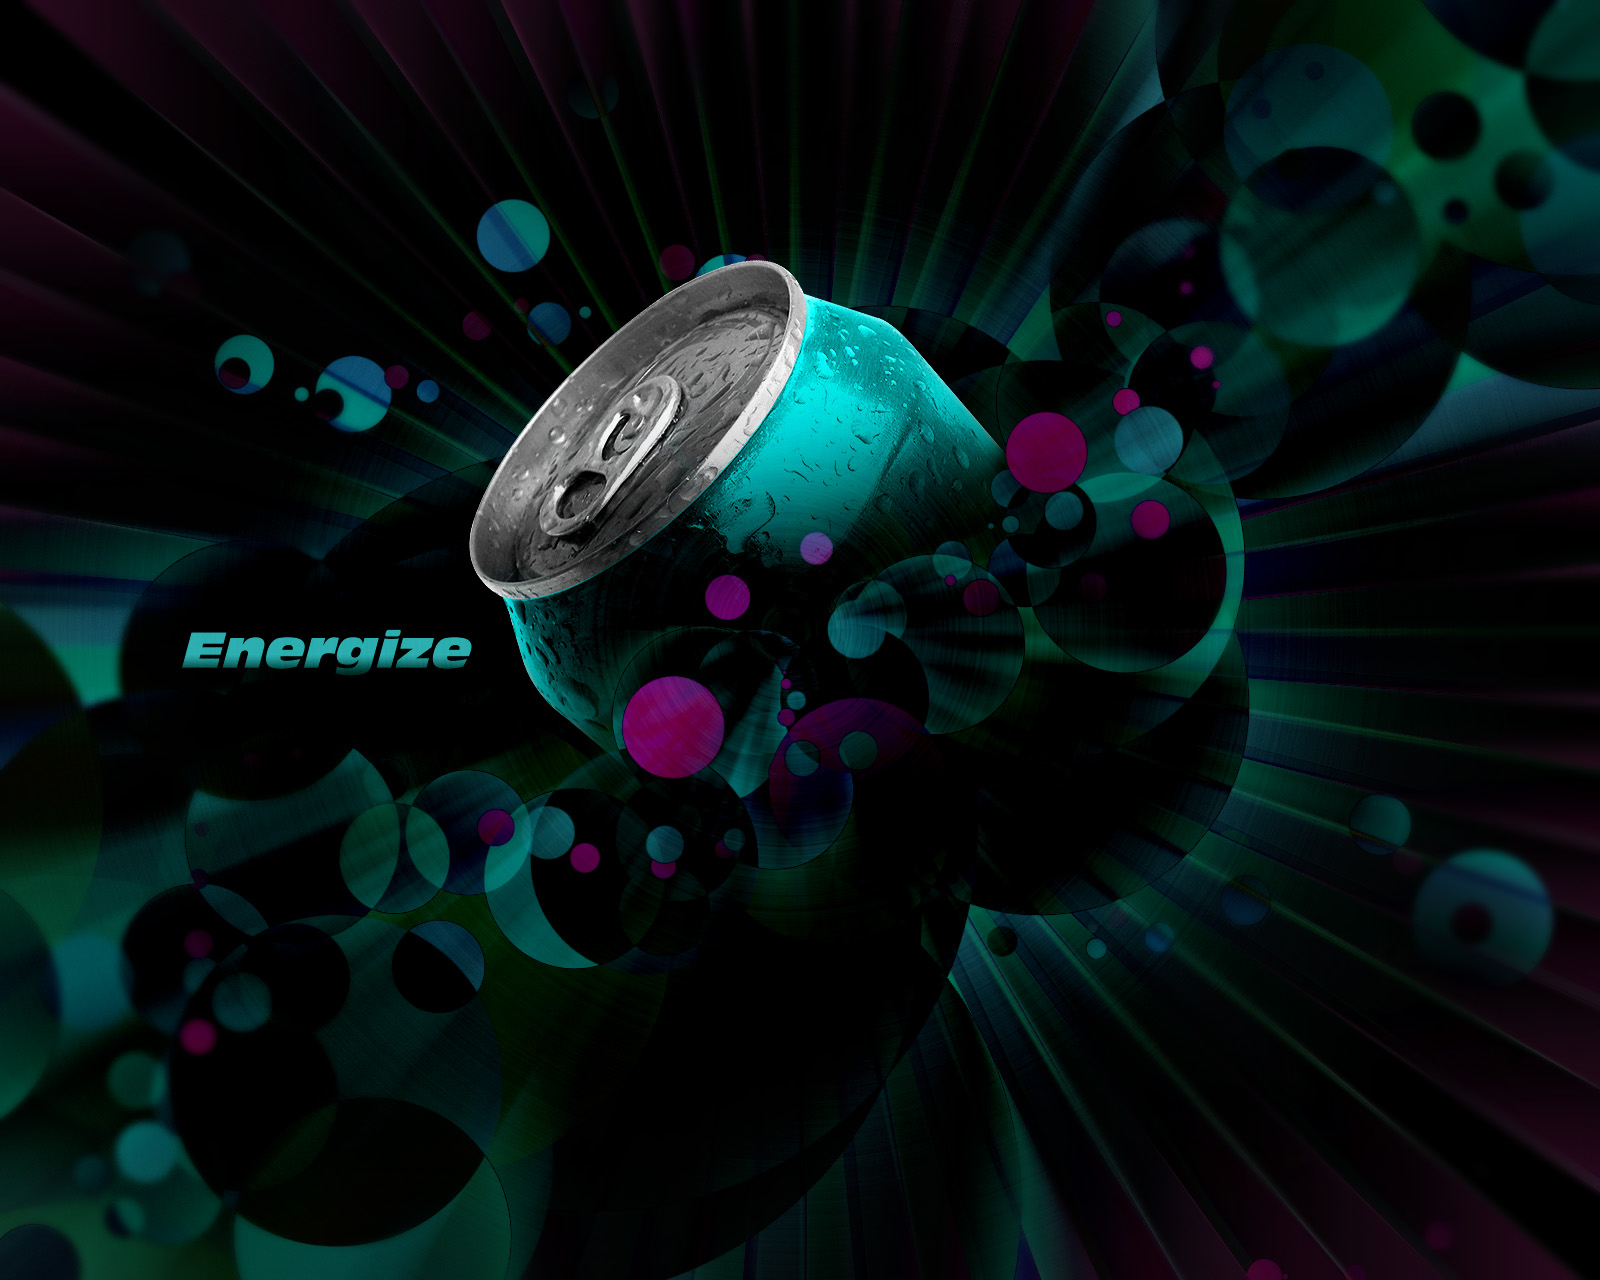 Create an Energy Drink Ad Design